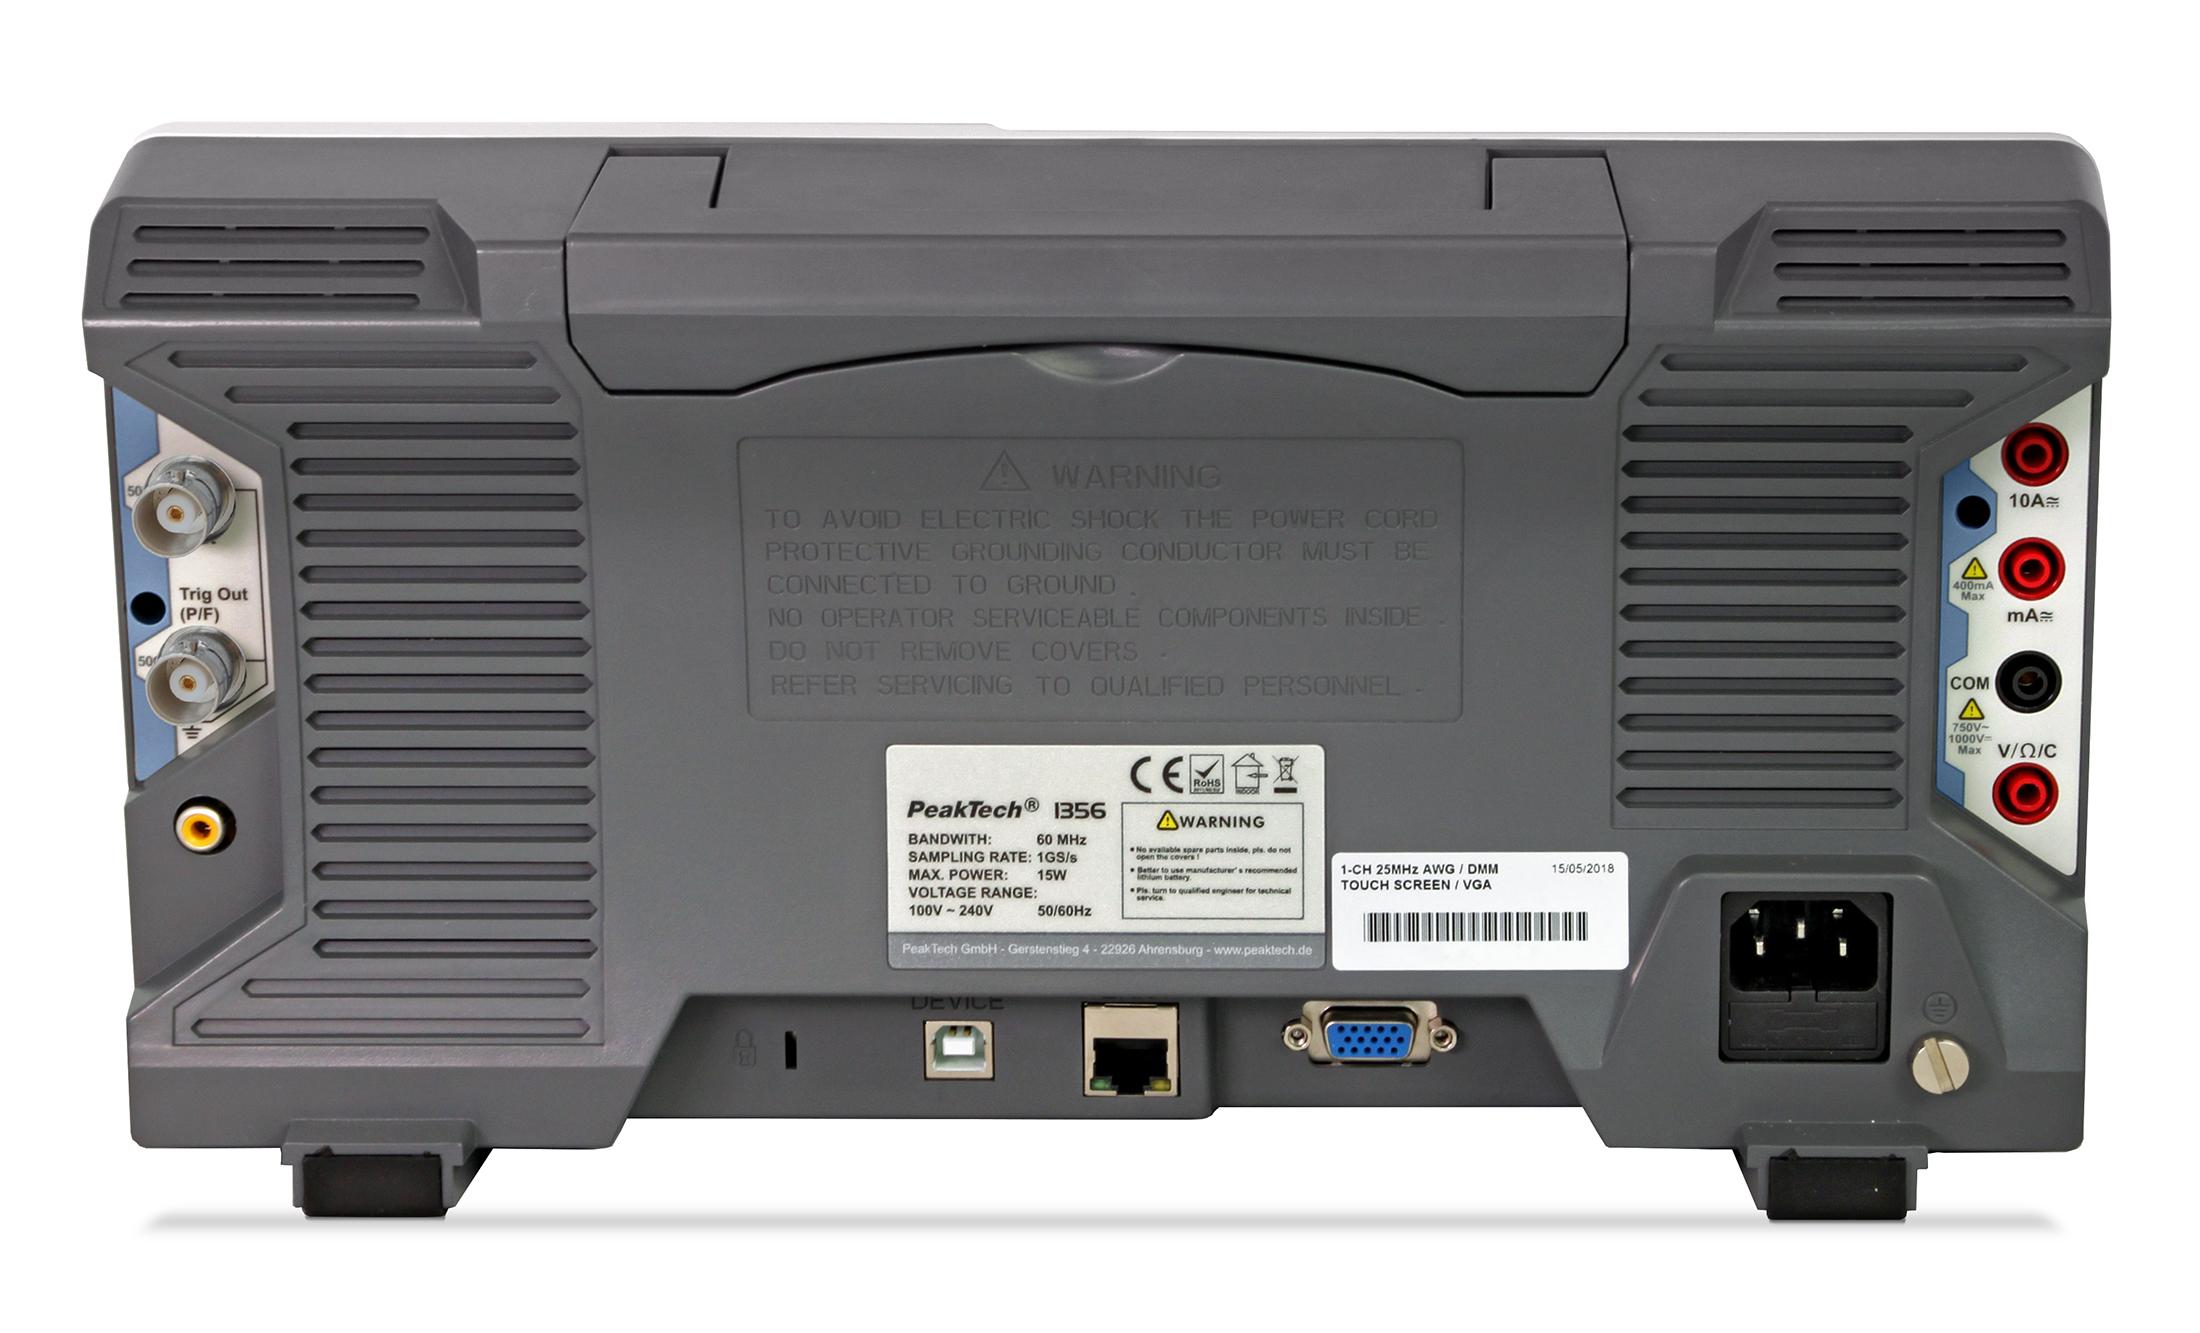 «PeakTech® P 1356» 60 MHz / 2 CH, 1 GS/s touchscreen oscilloscope